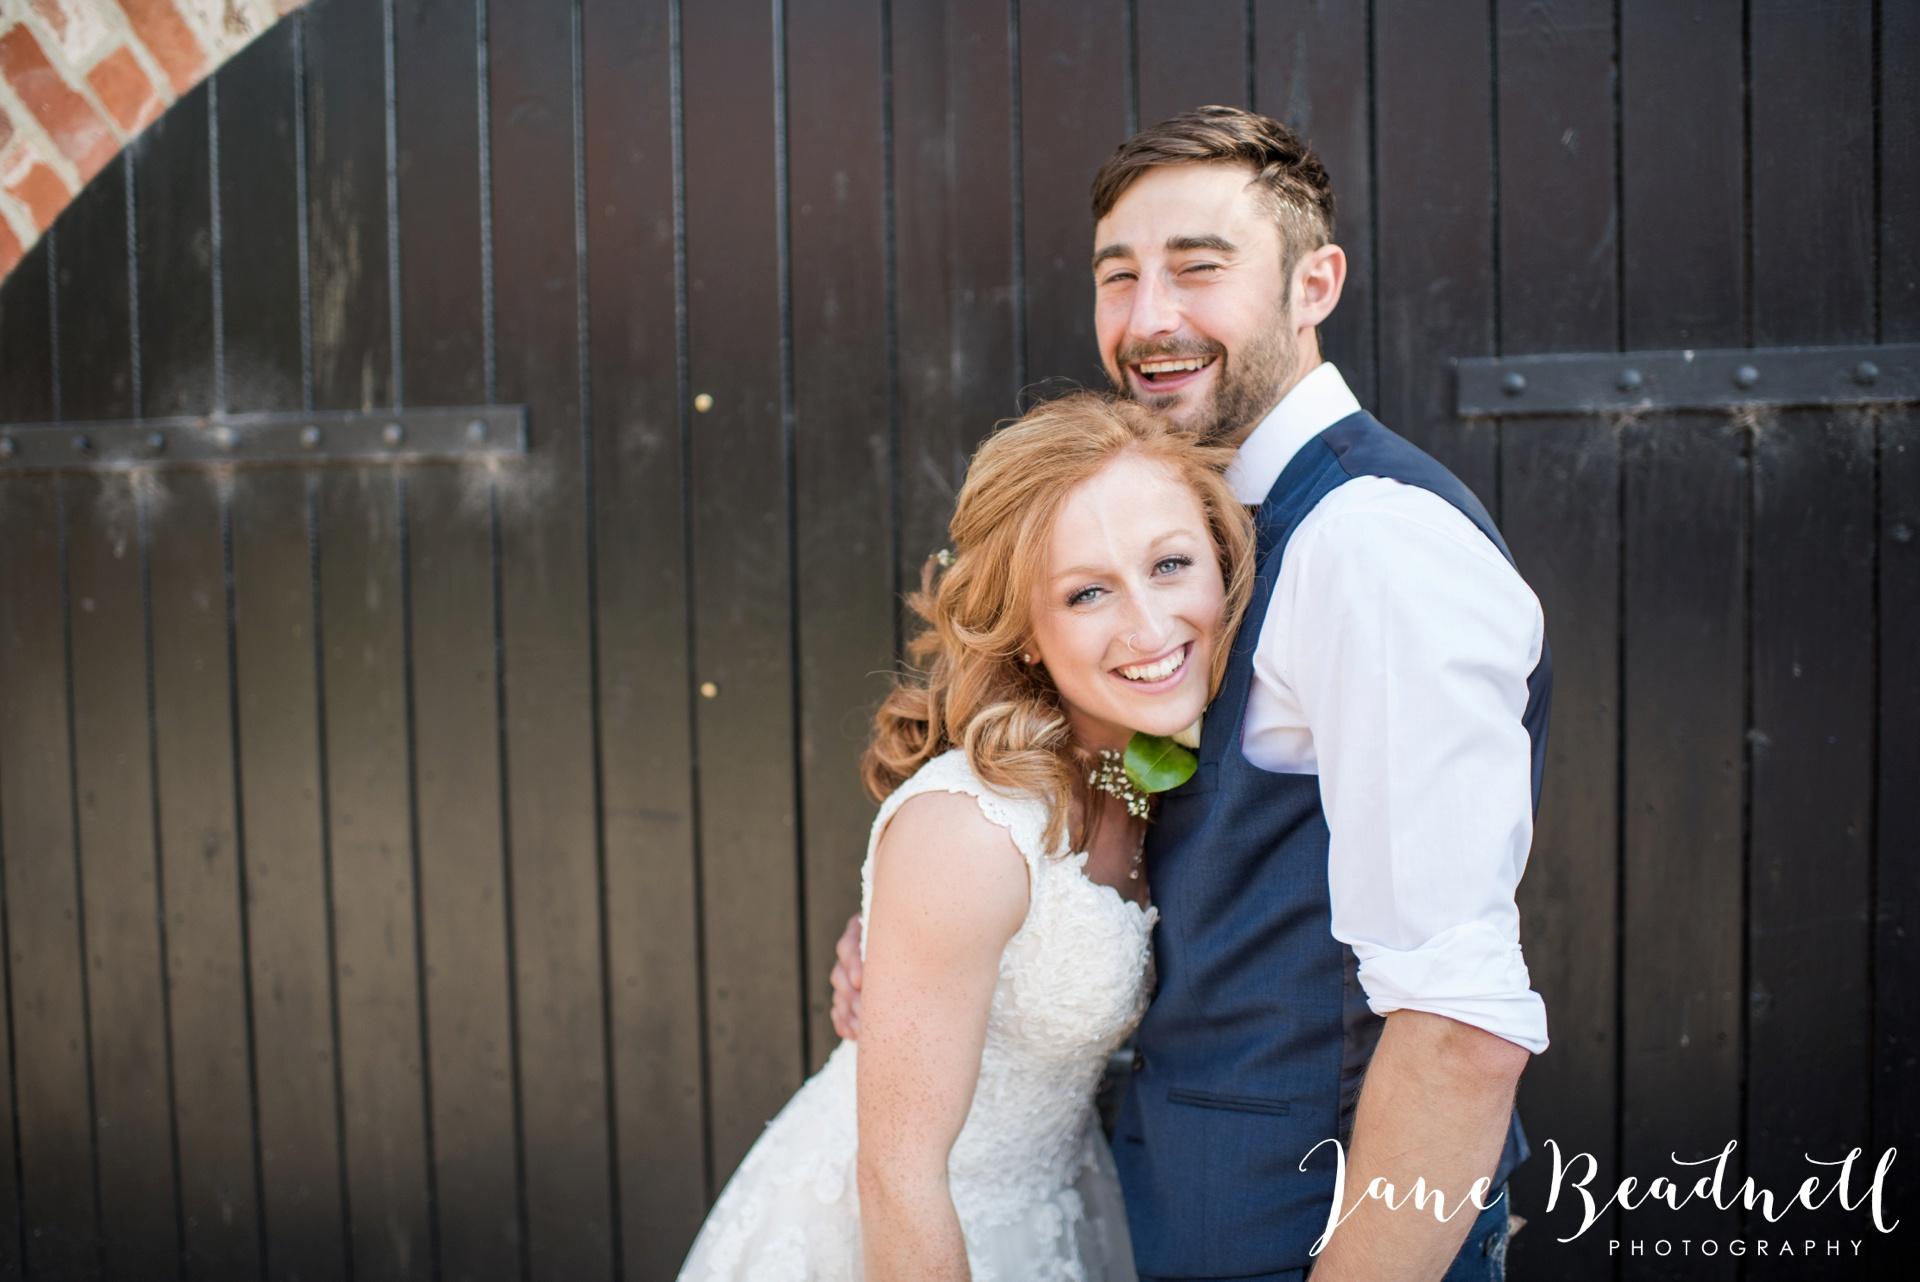 yorkshire-fine-art-wedding-photographer-jane-beadnell-photography-poppleton-york_0107